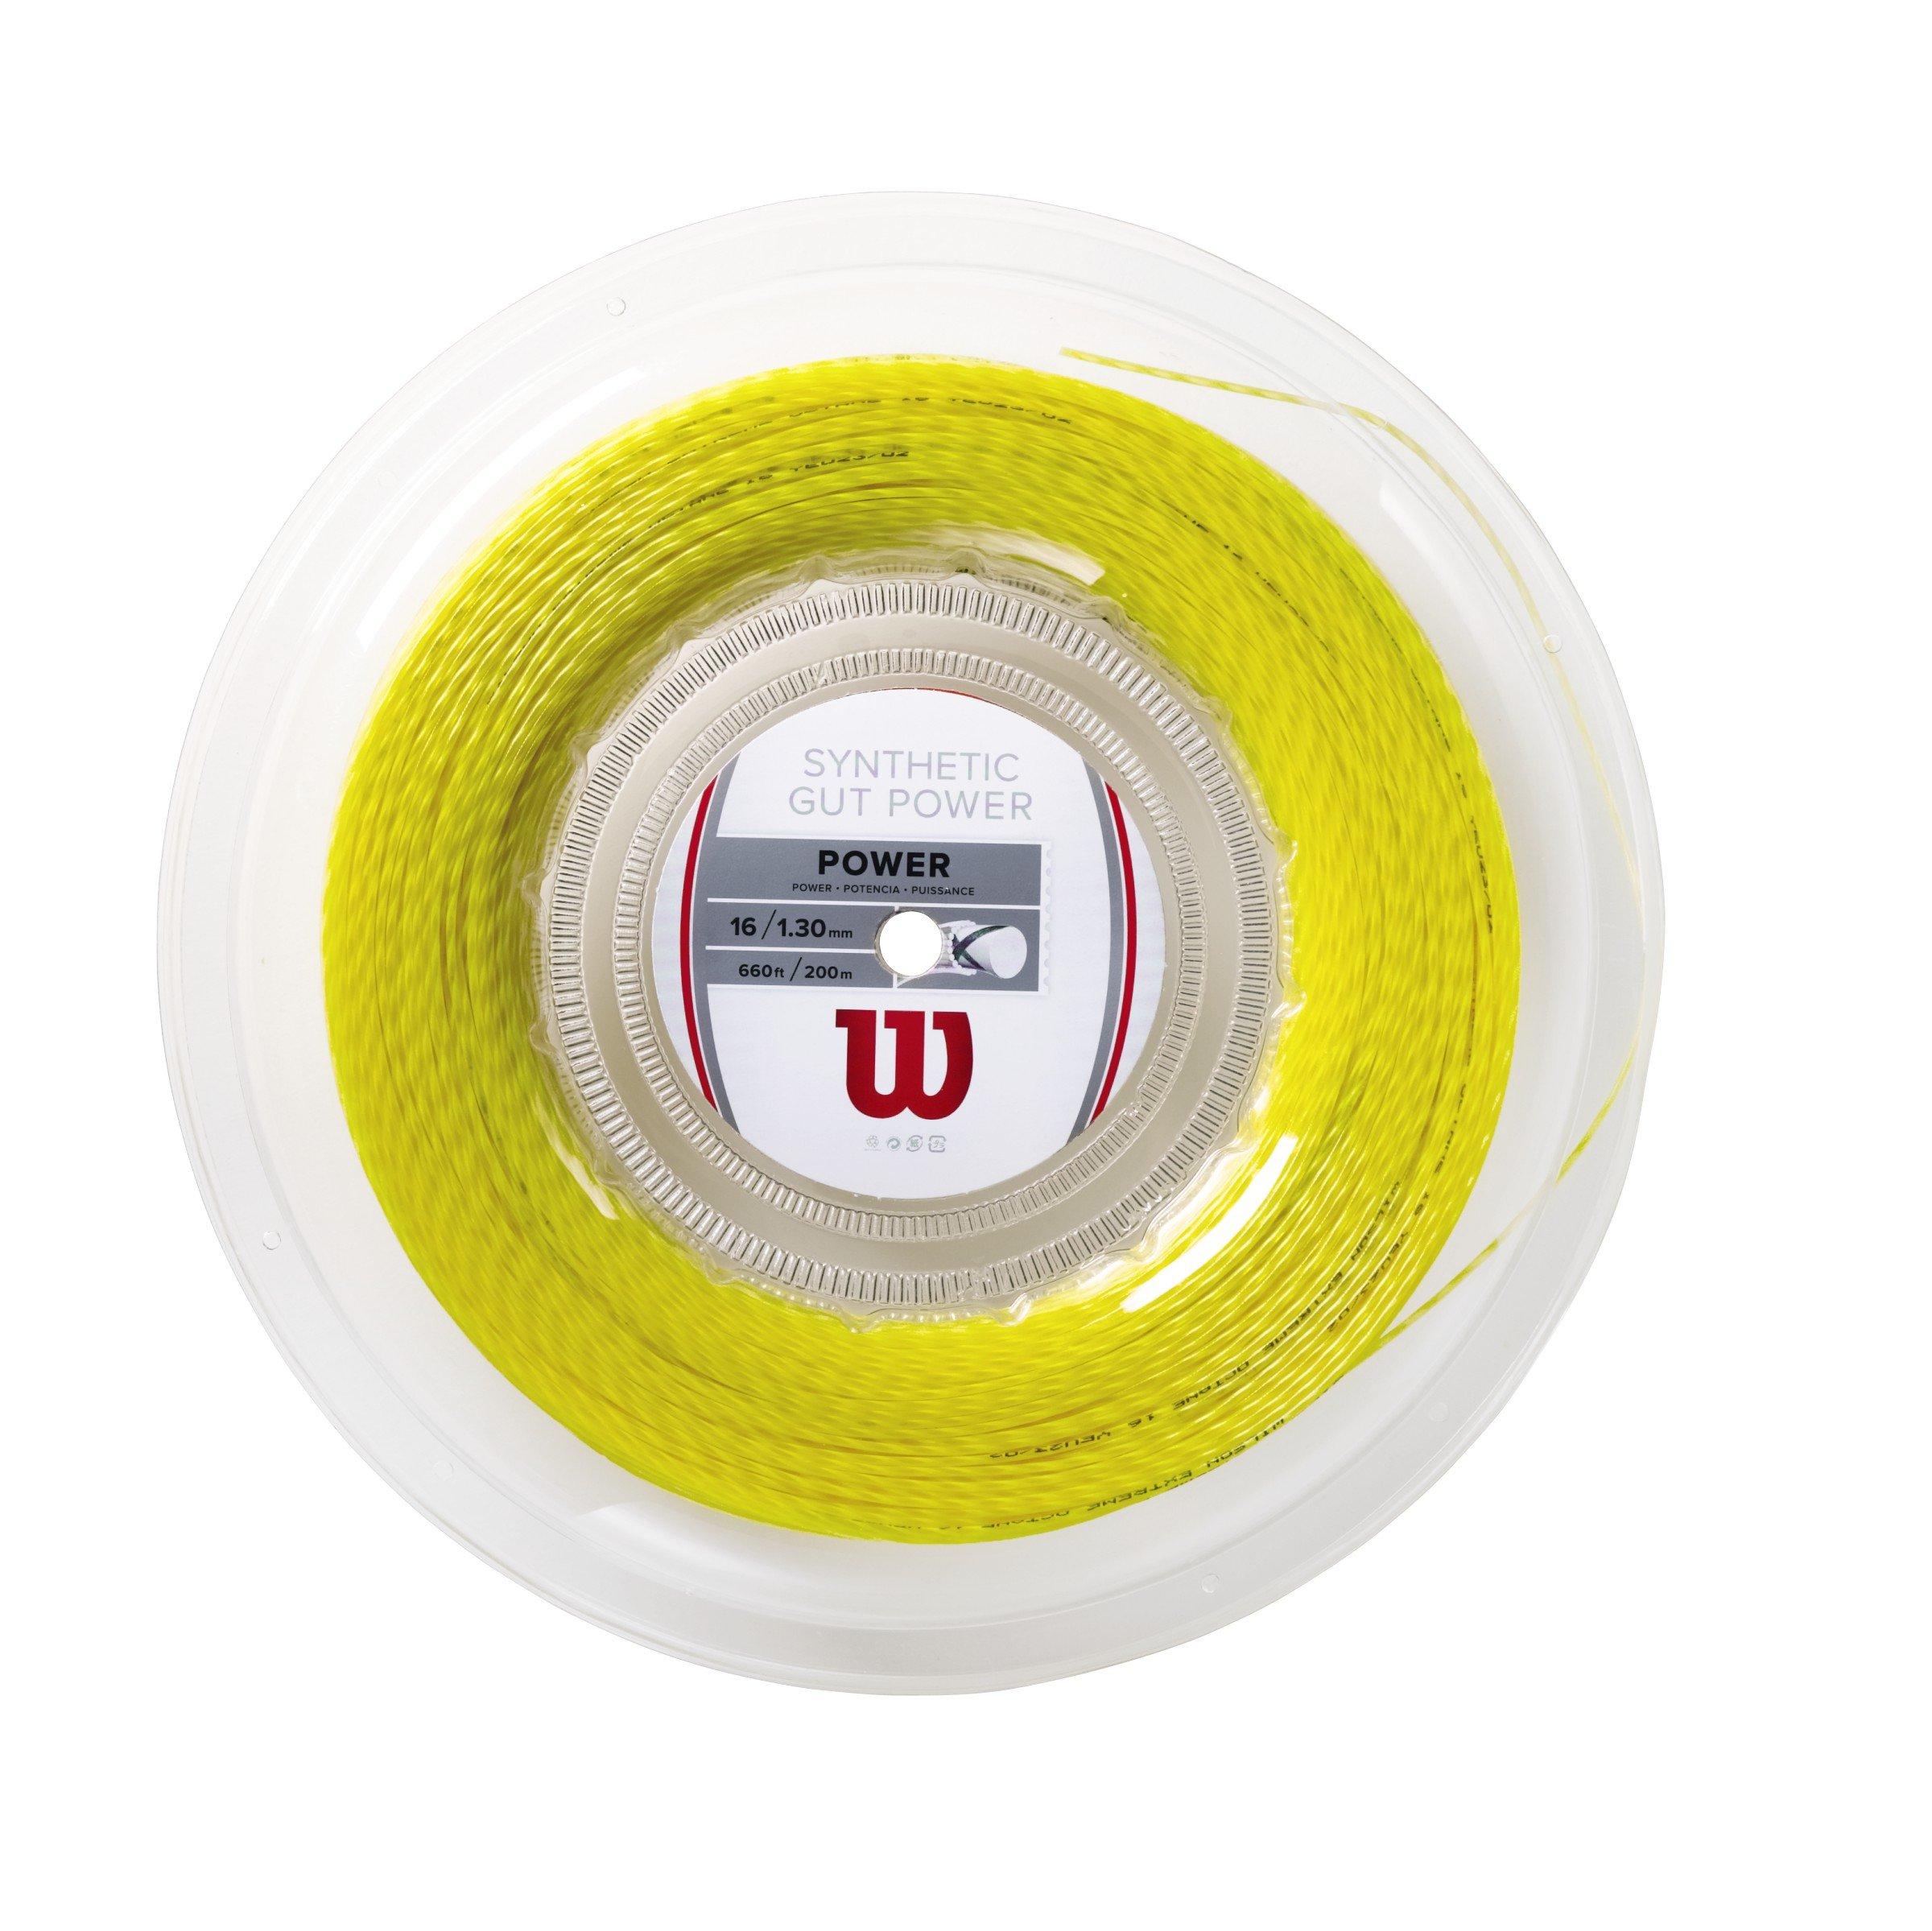 Wilson Synthetic Gut Power 660-Feet Reel, Gold, 16